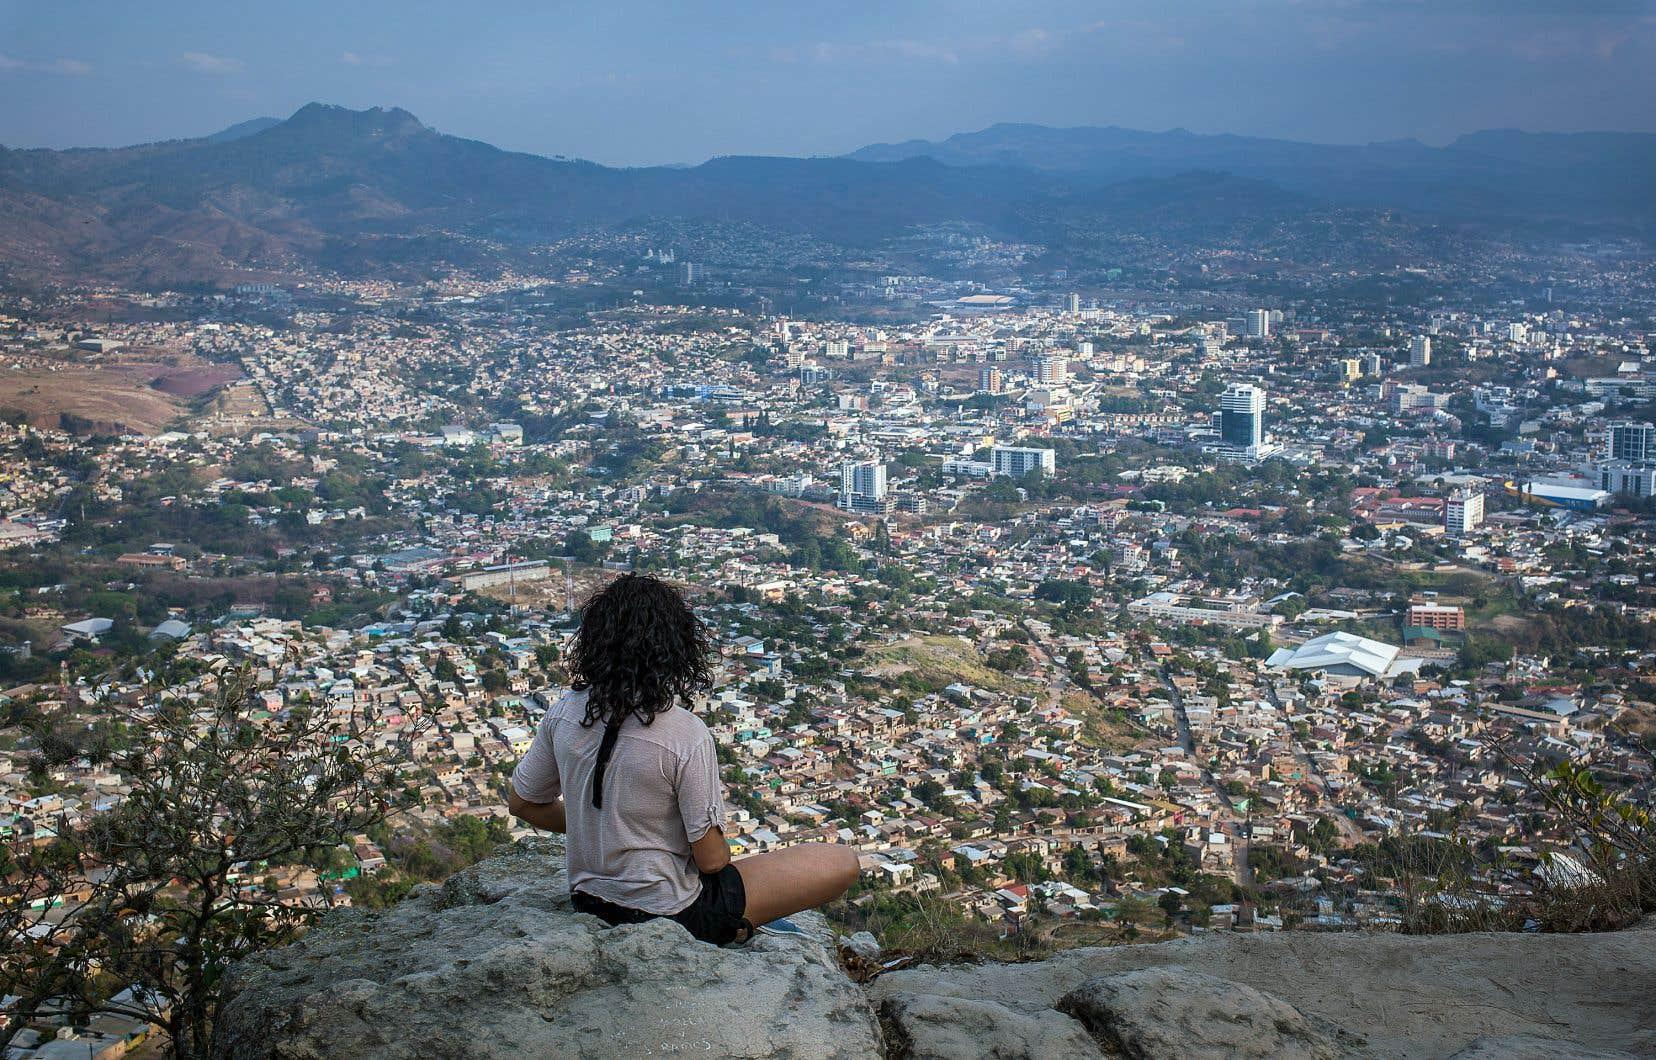 Une vue sur Tegucigalpa depuis la colline El Picacho qui surplombe la ville.